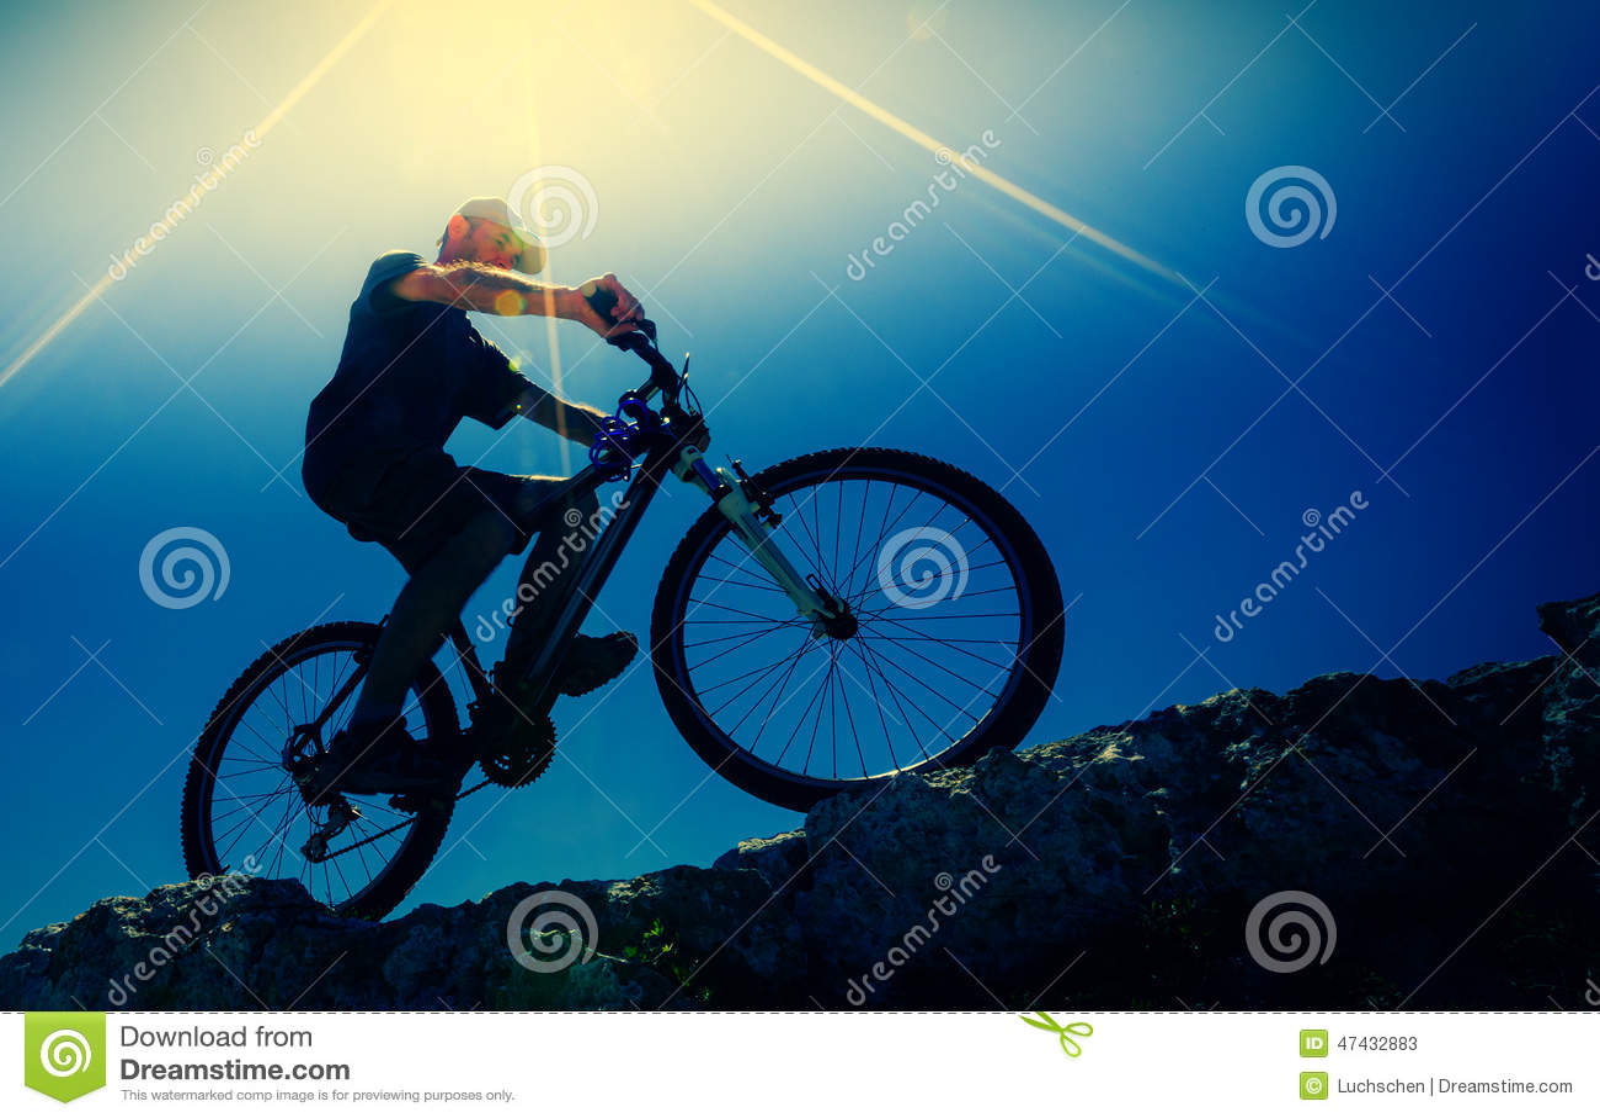 Ciclista masculino en una bici de montaña, retroiluminada